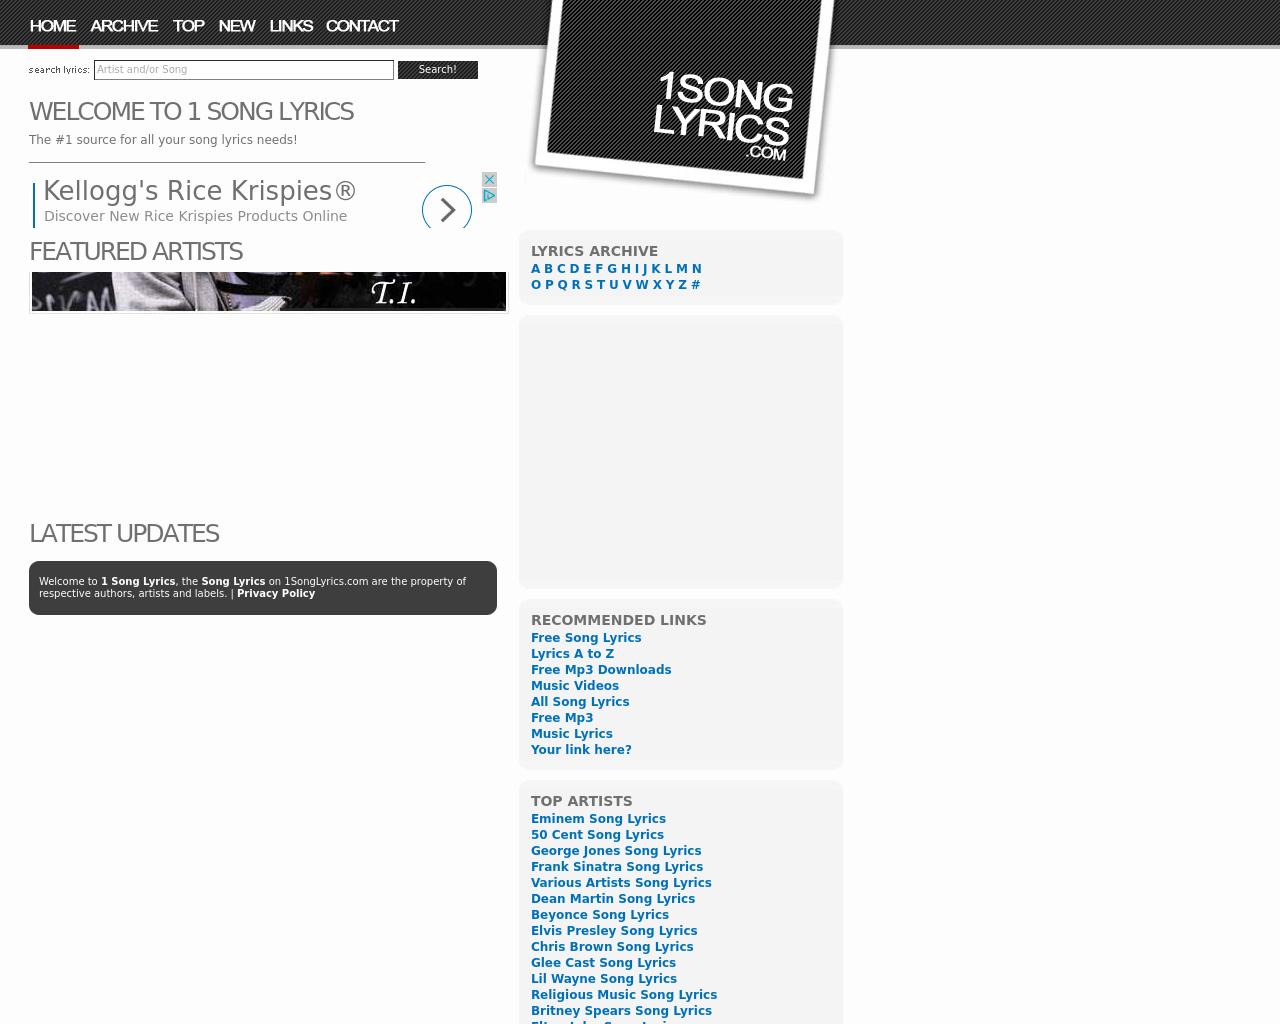 1-Song-Lyrics-Advertising-Reviews-Pricing